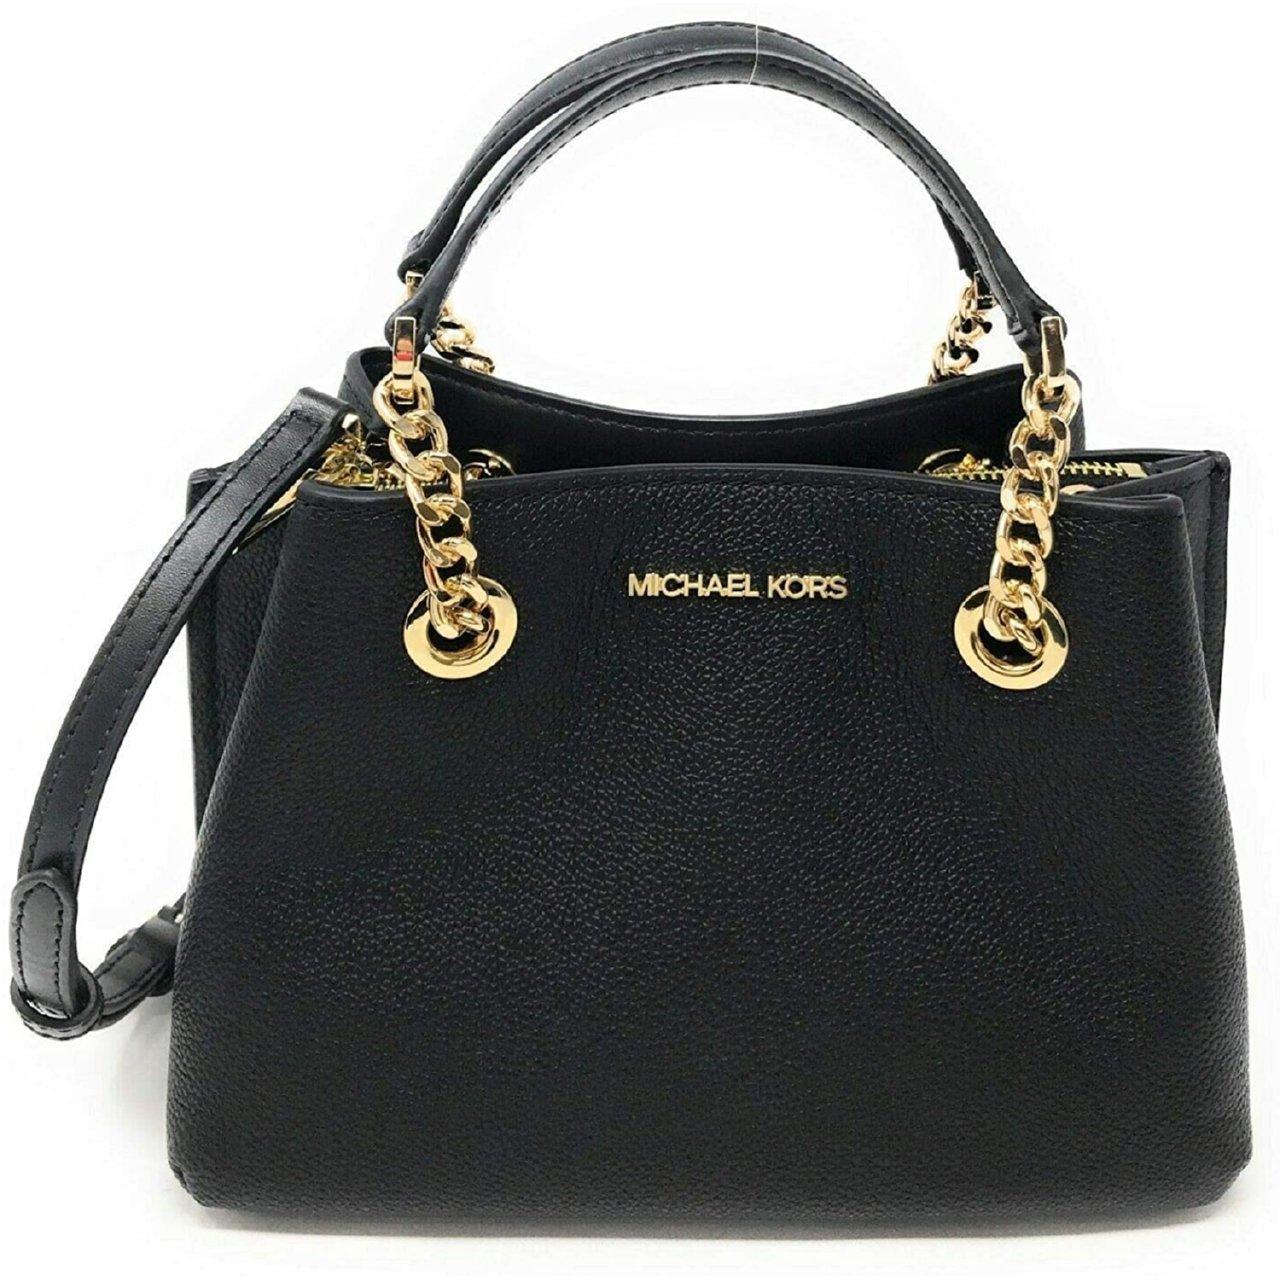 Michael Kors Women's Teagen Small Messenger Crossbody Bag Black MK29426